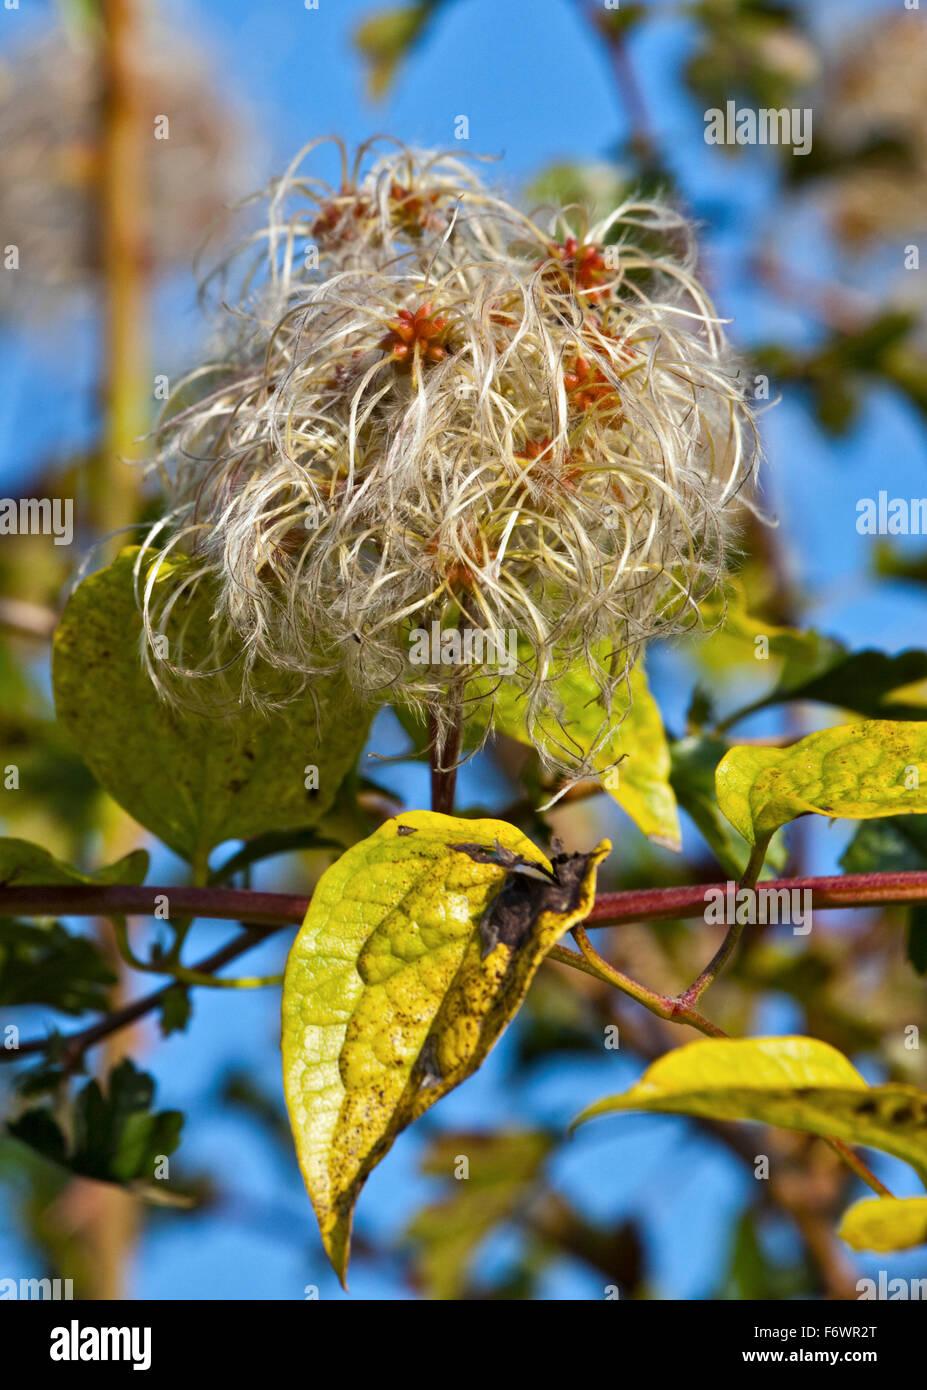 Old Man's Beard (clematis vitalba) seedhead - Stock Image